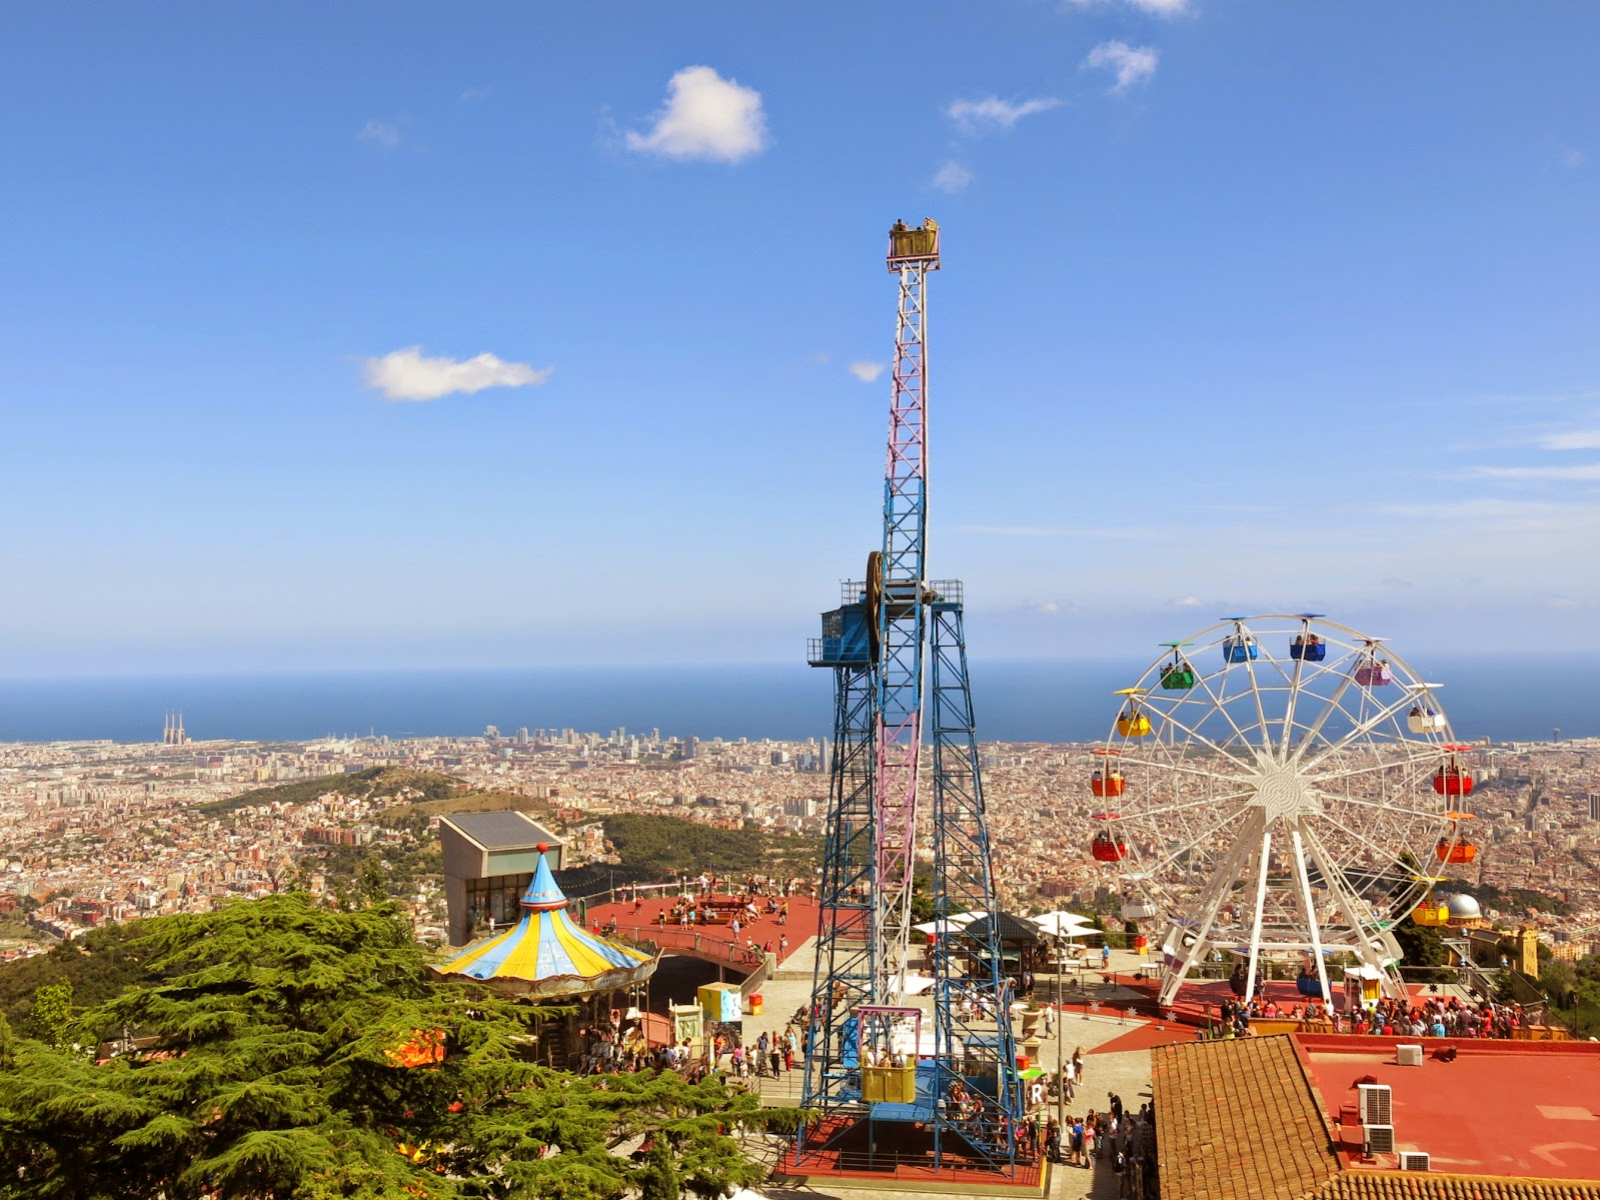 Tibidabo i Barcelona